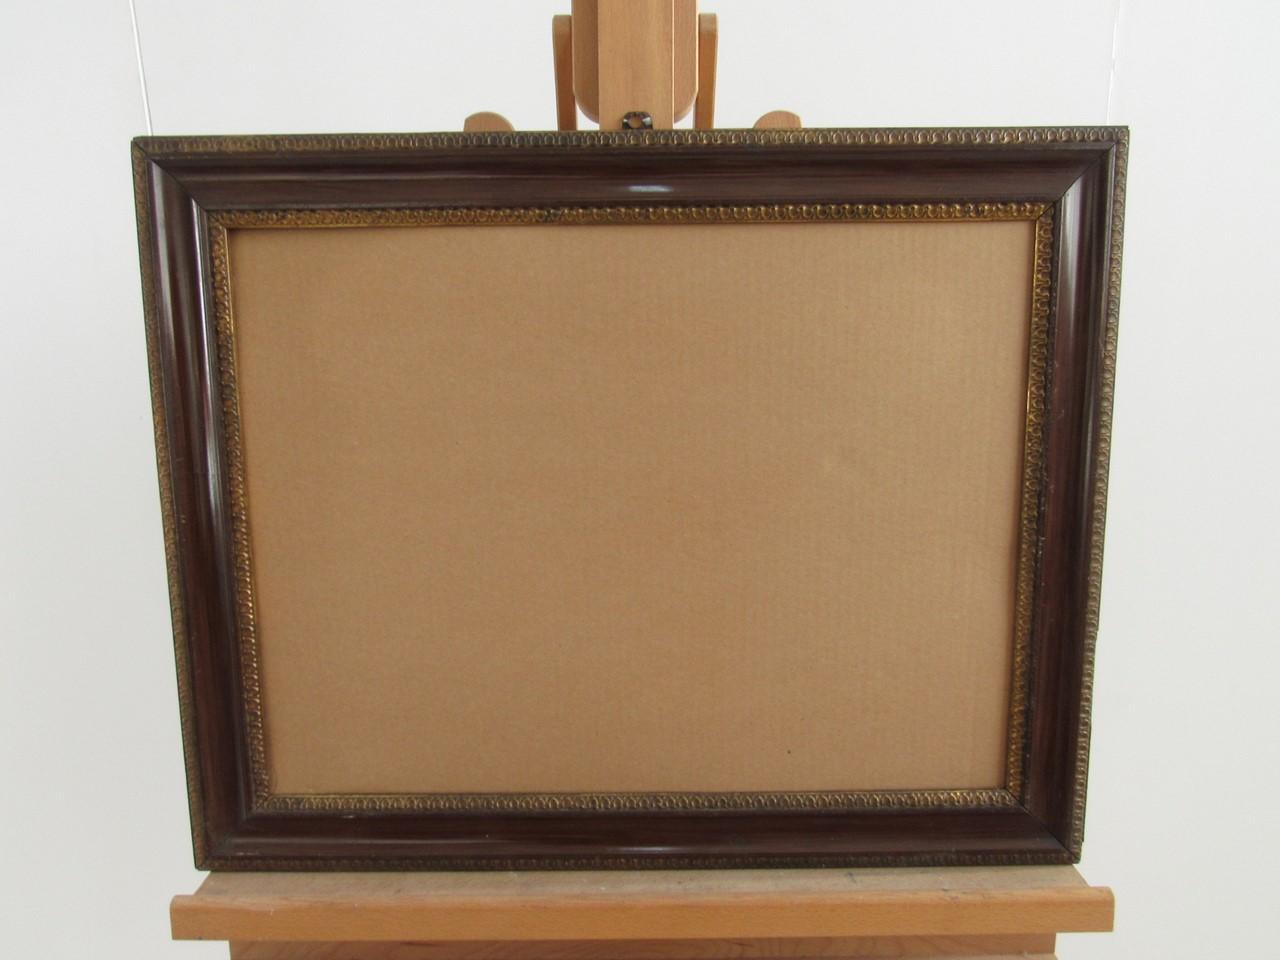 Antik Schellack Bilderrahmen, Braun & Gold - Sammlerparadies24